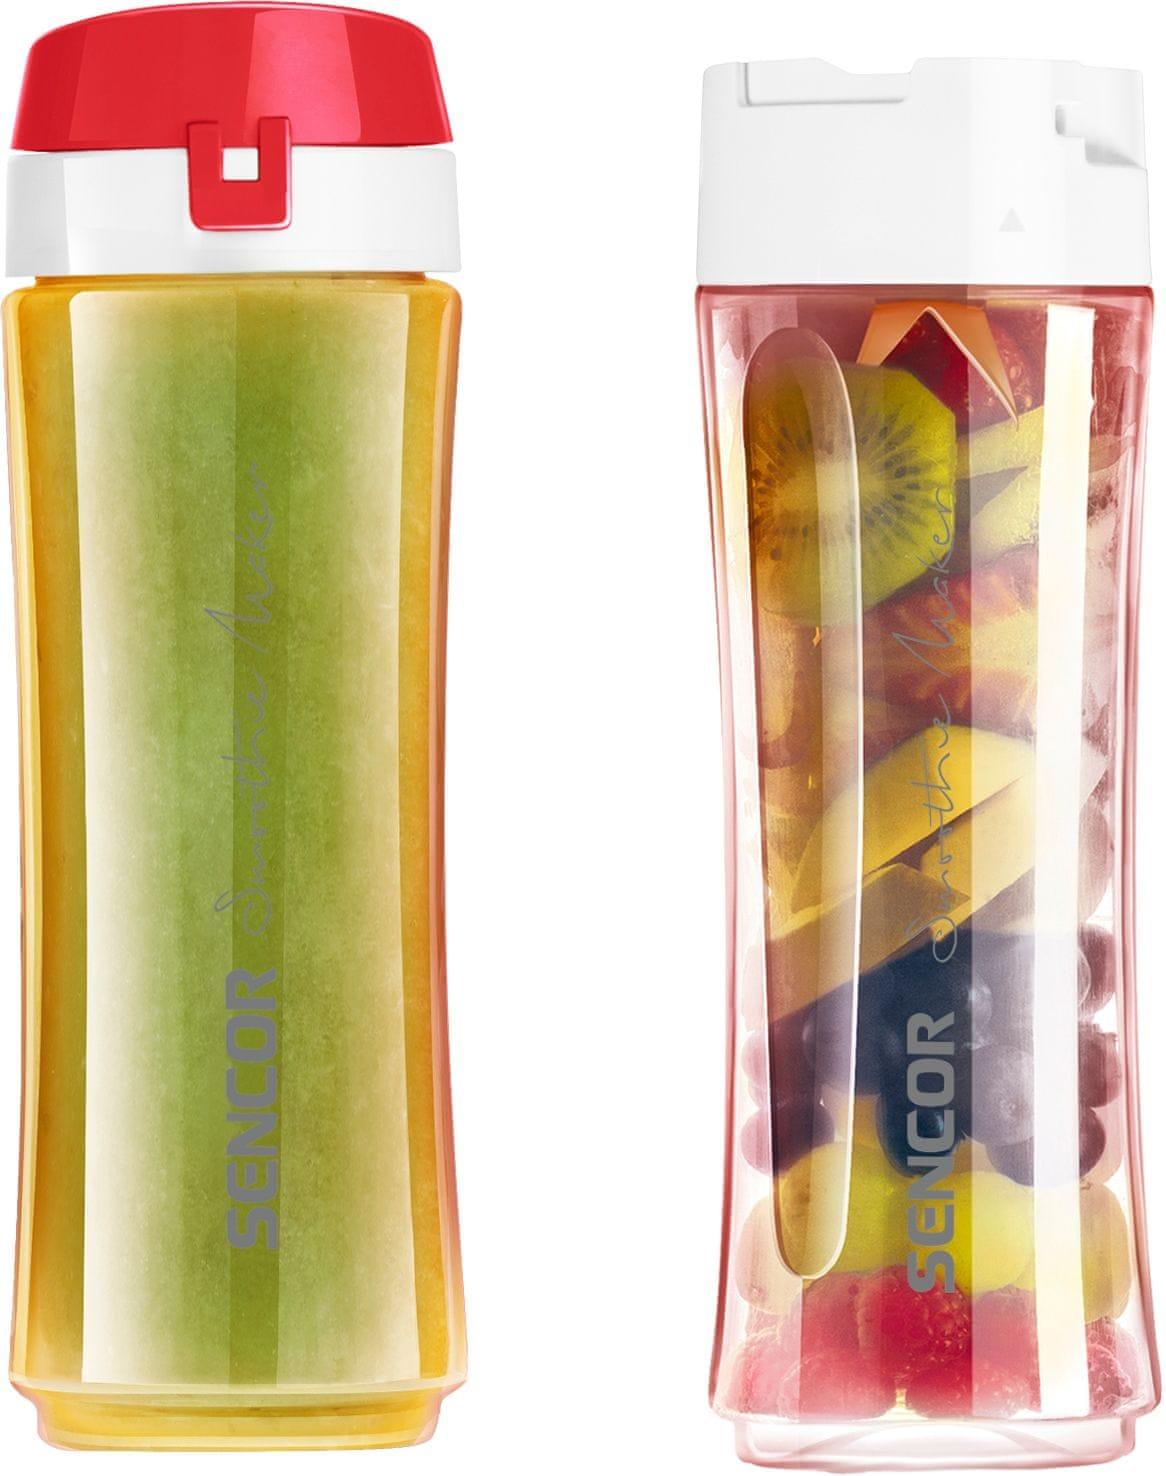 Sencor SBL 2310 mixovací láhev